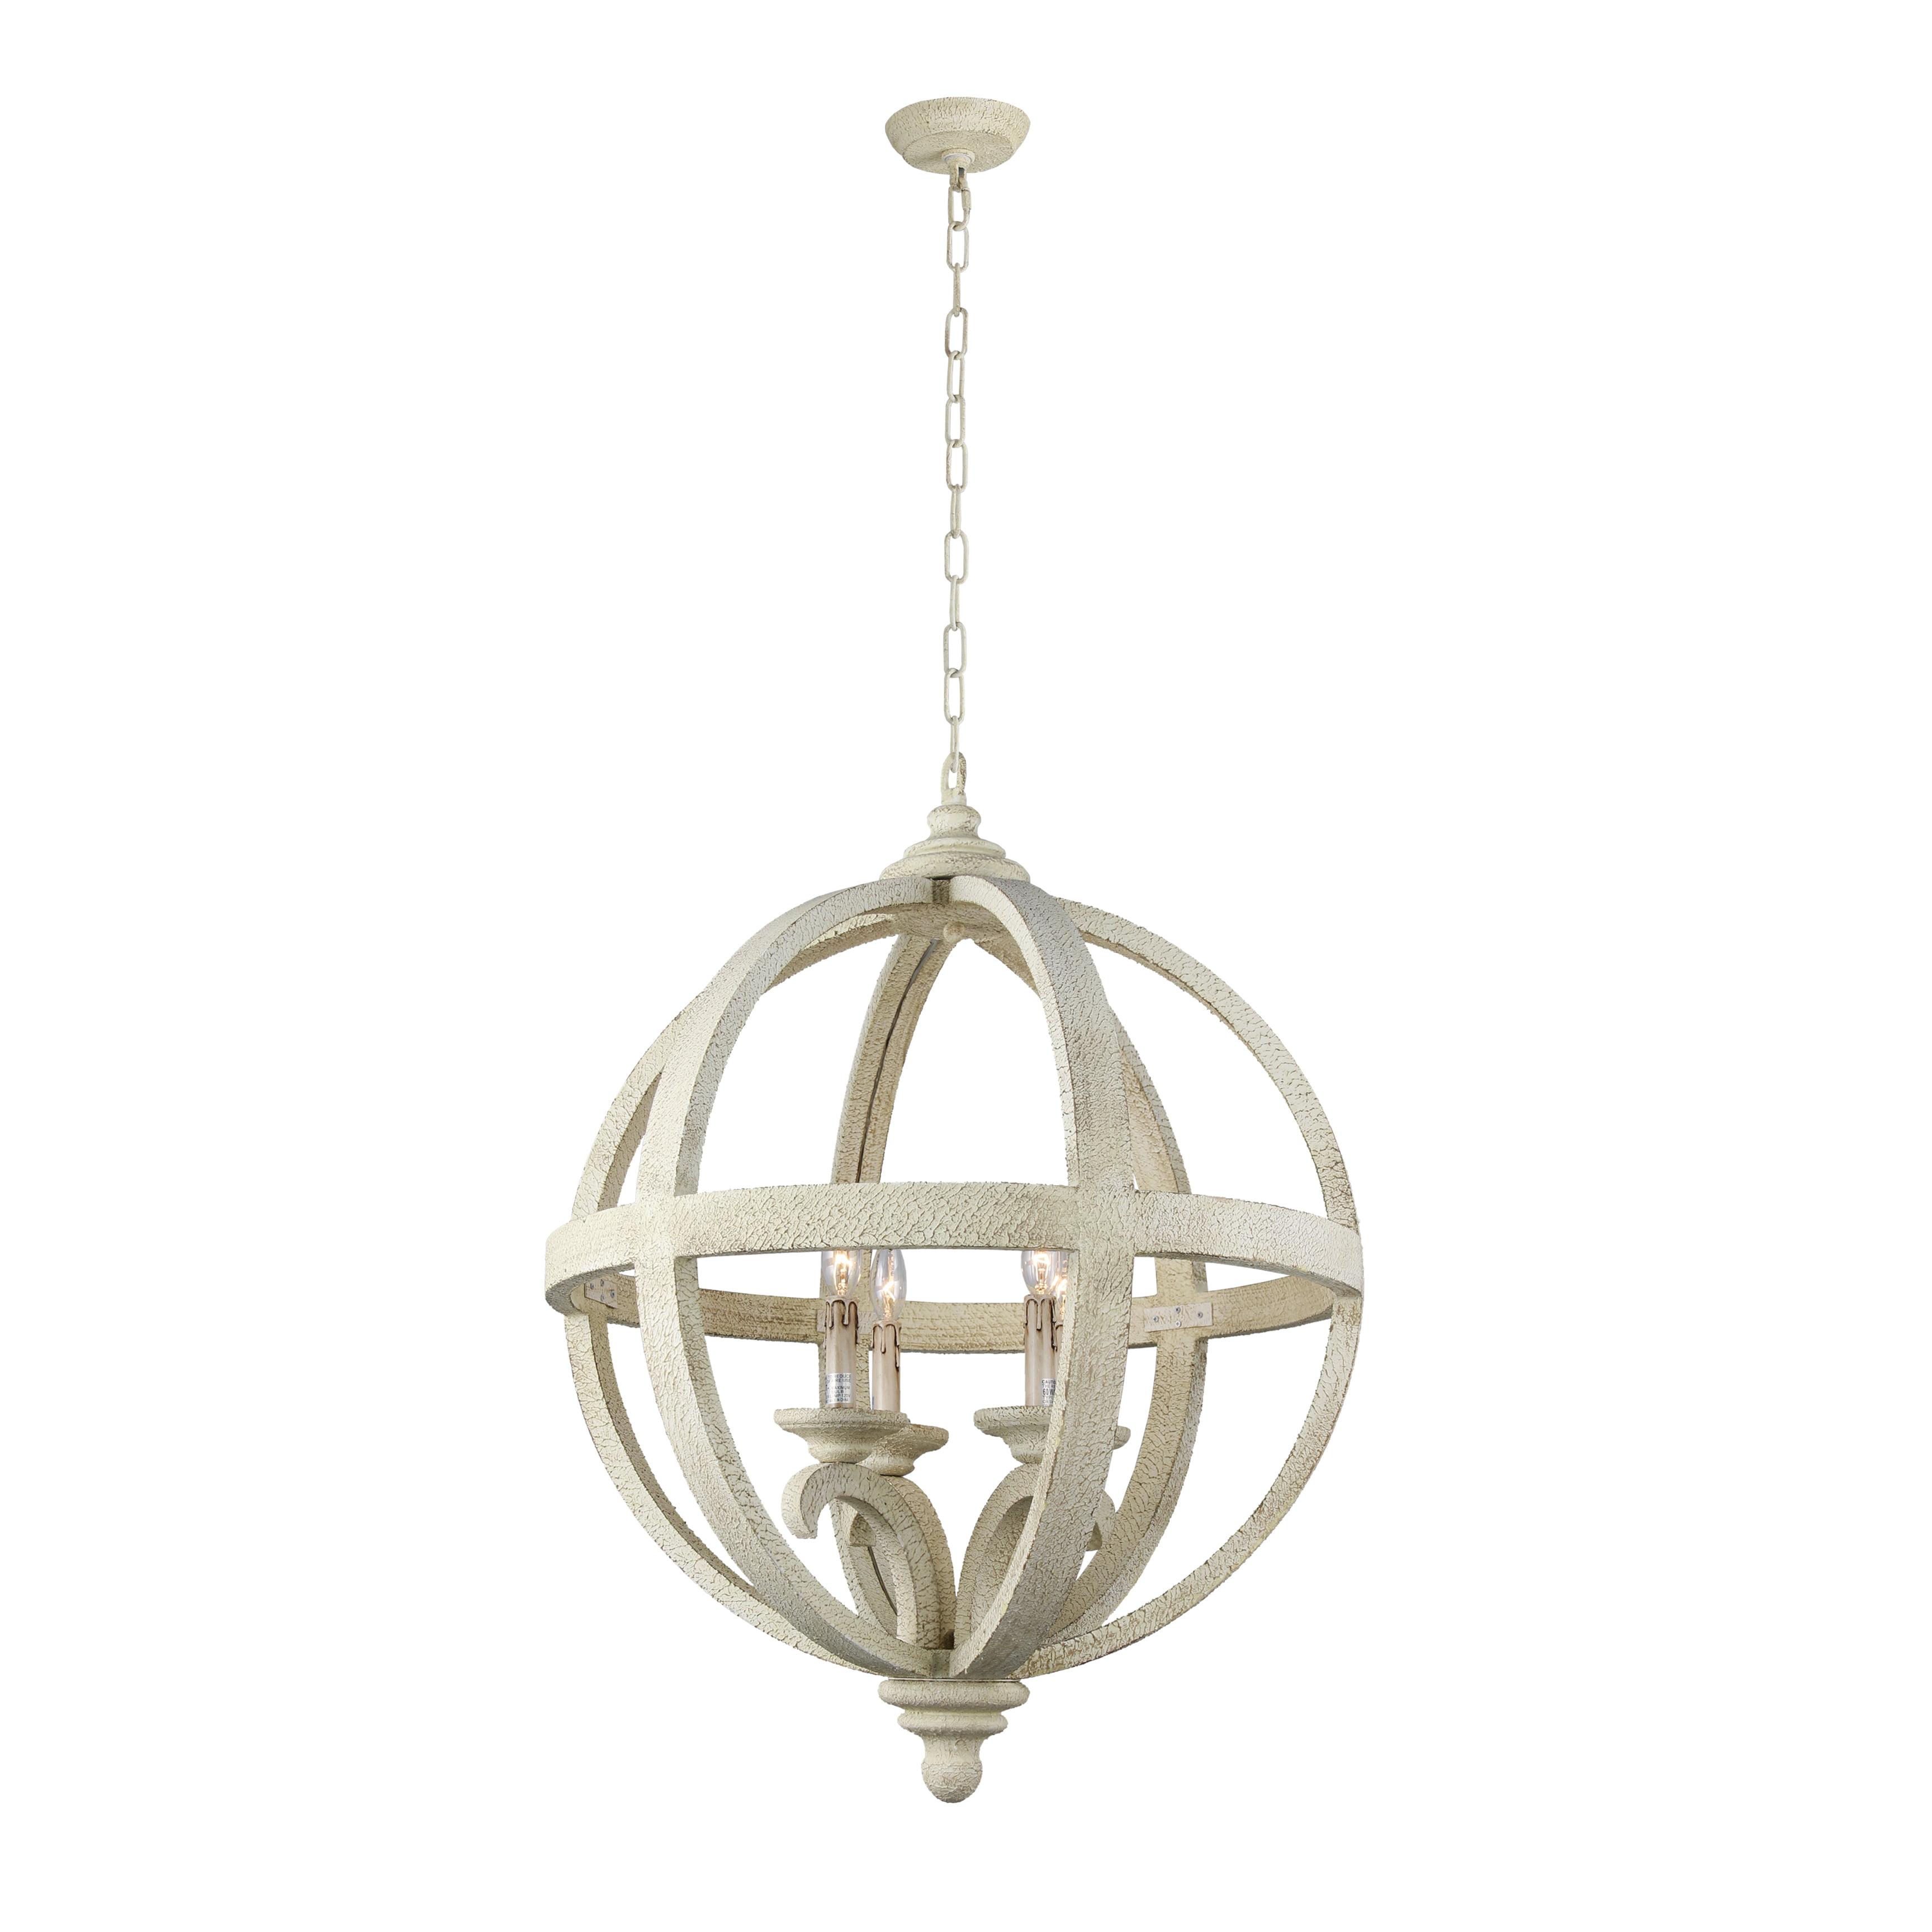 Hercules 4 light chandelier in wooden globe frame neutral